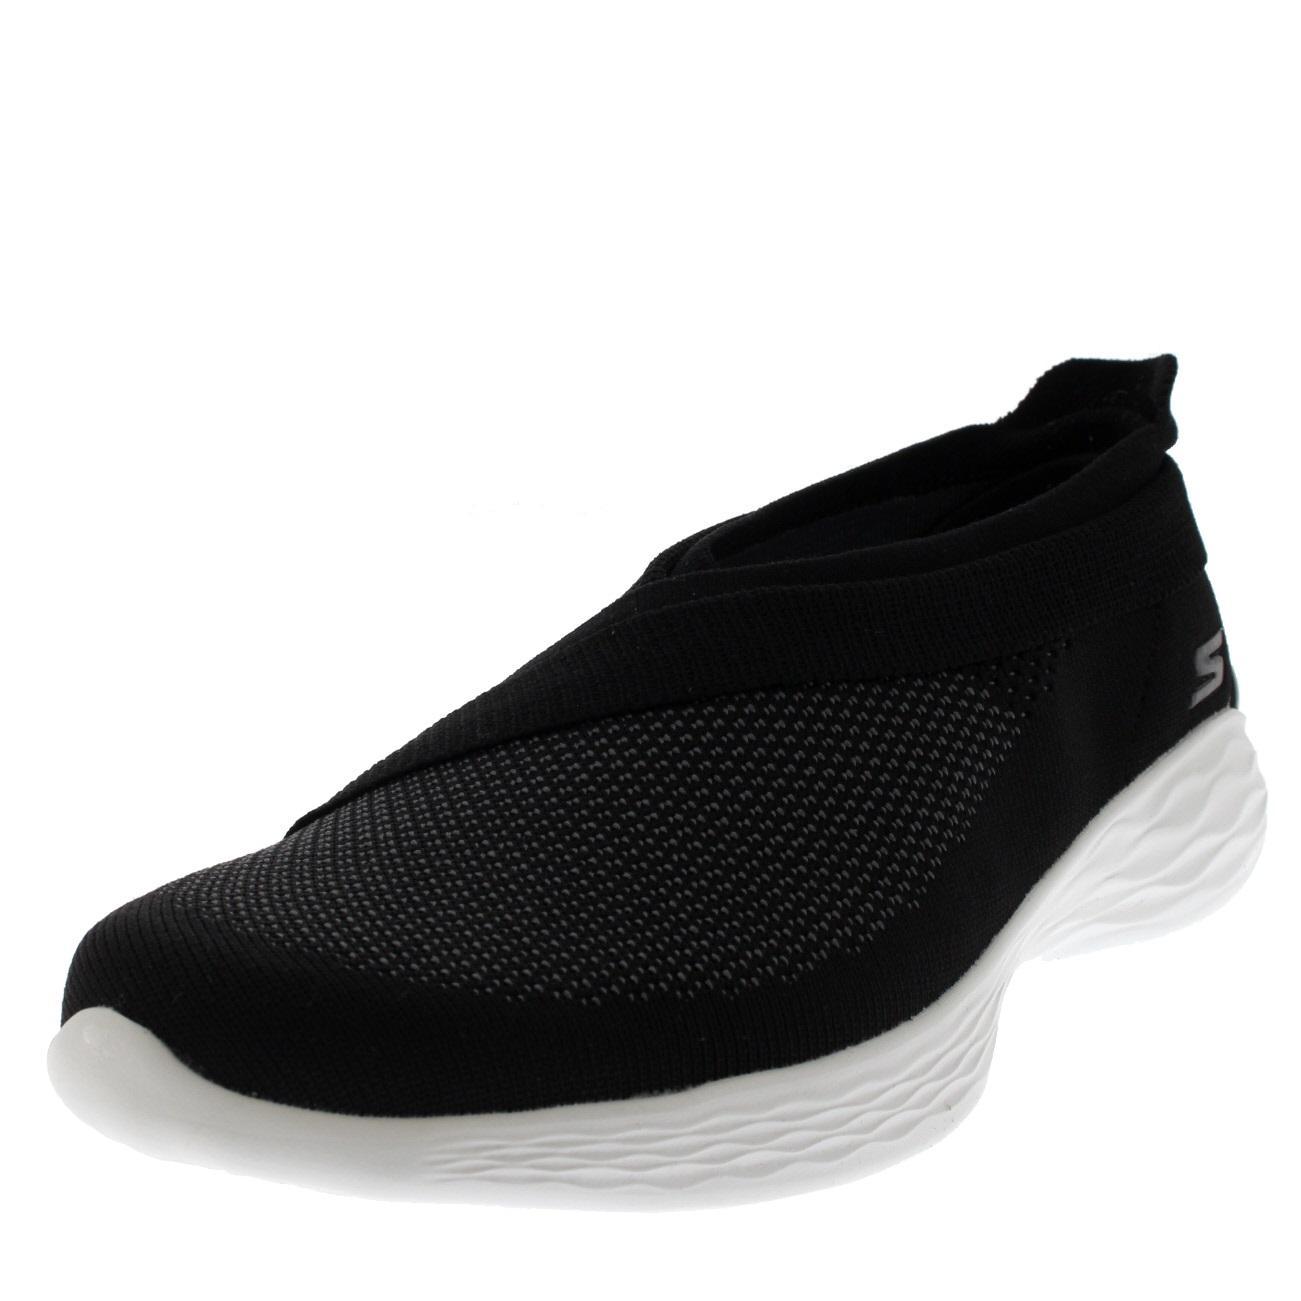 Womens Skechers You Luxe Lightweight Flexible Memory Foam Yoga Trainers UK 3-8